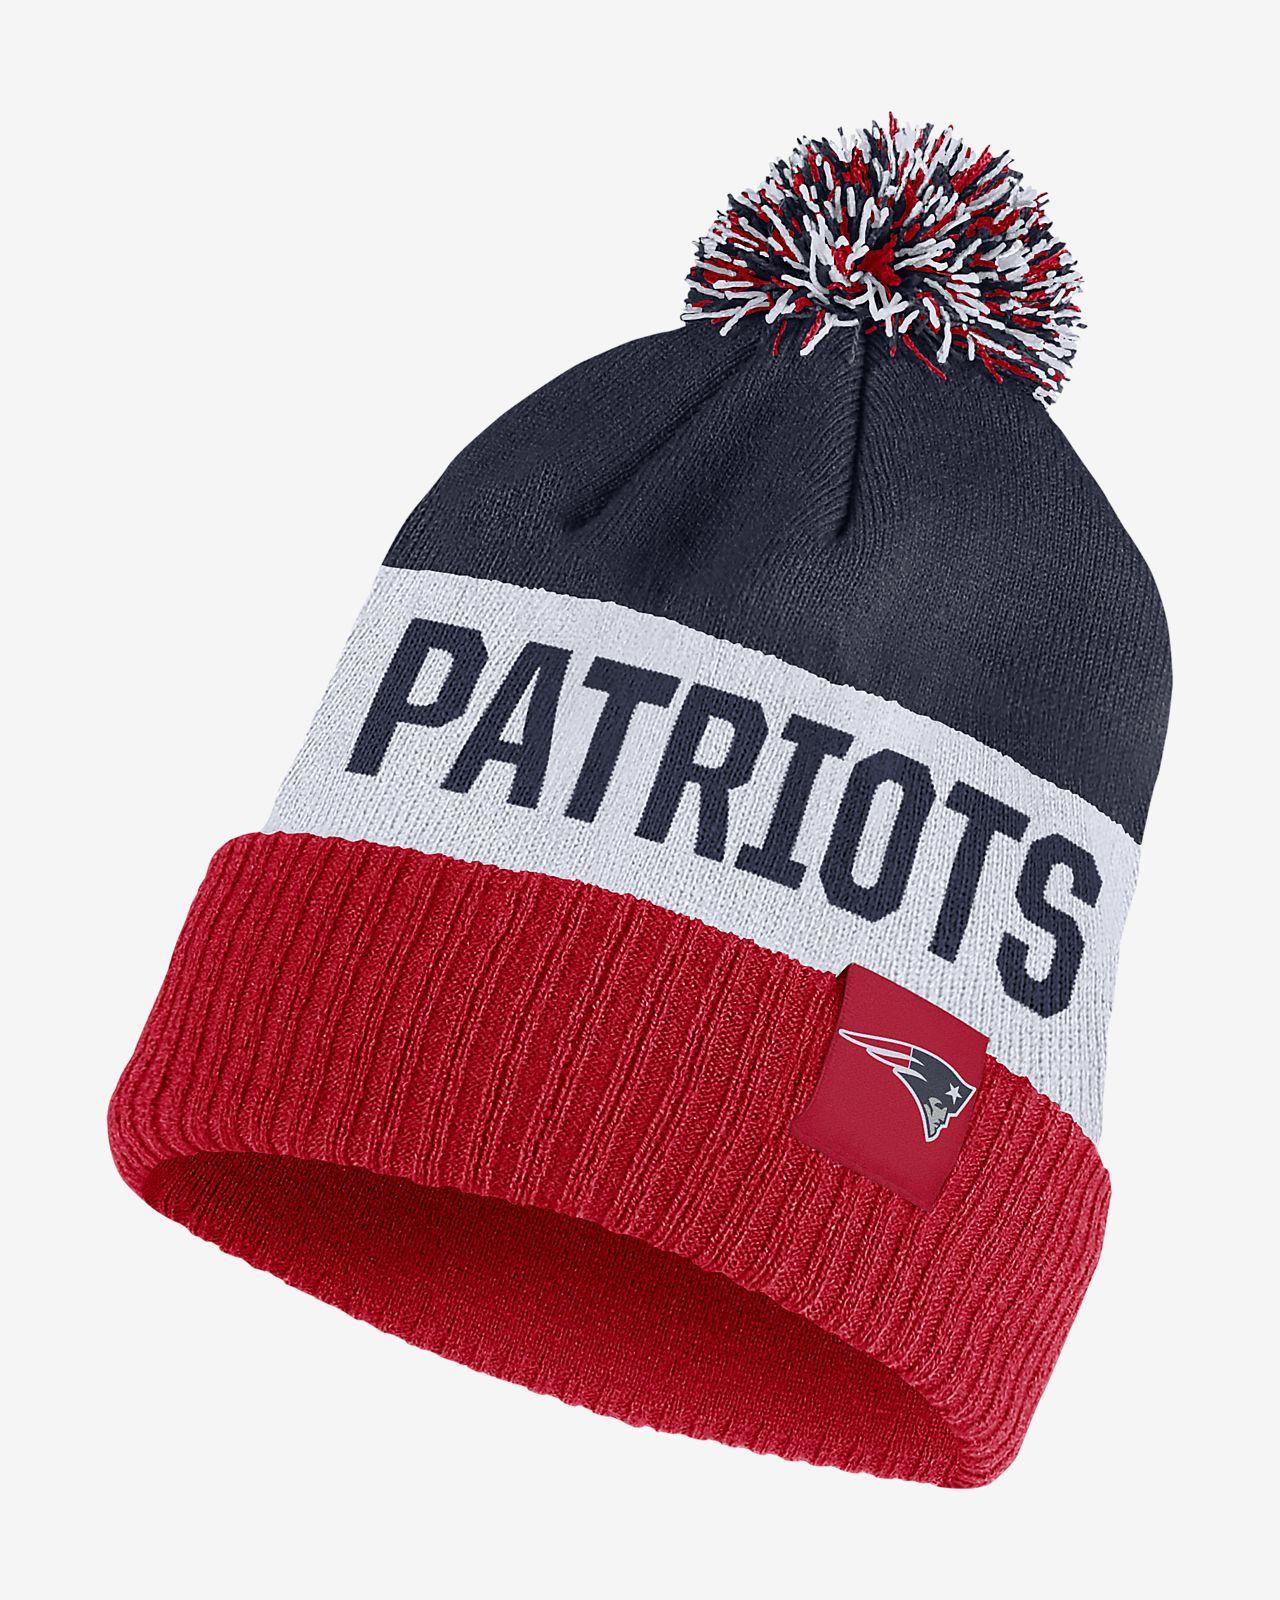 Nike (NFL Patriots) beanie sapka